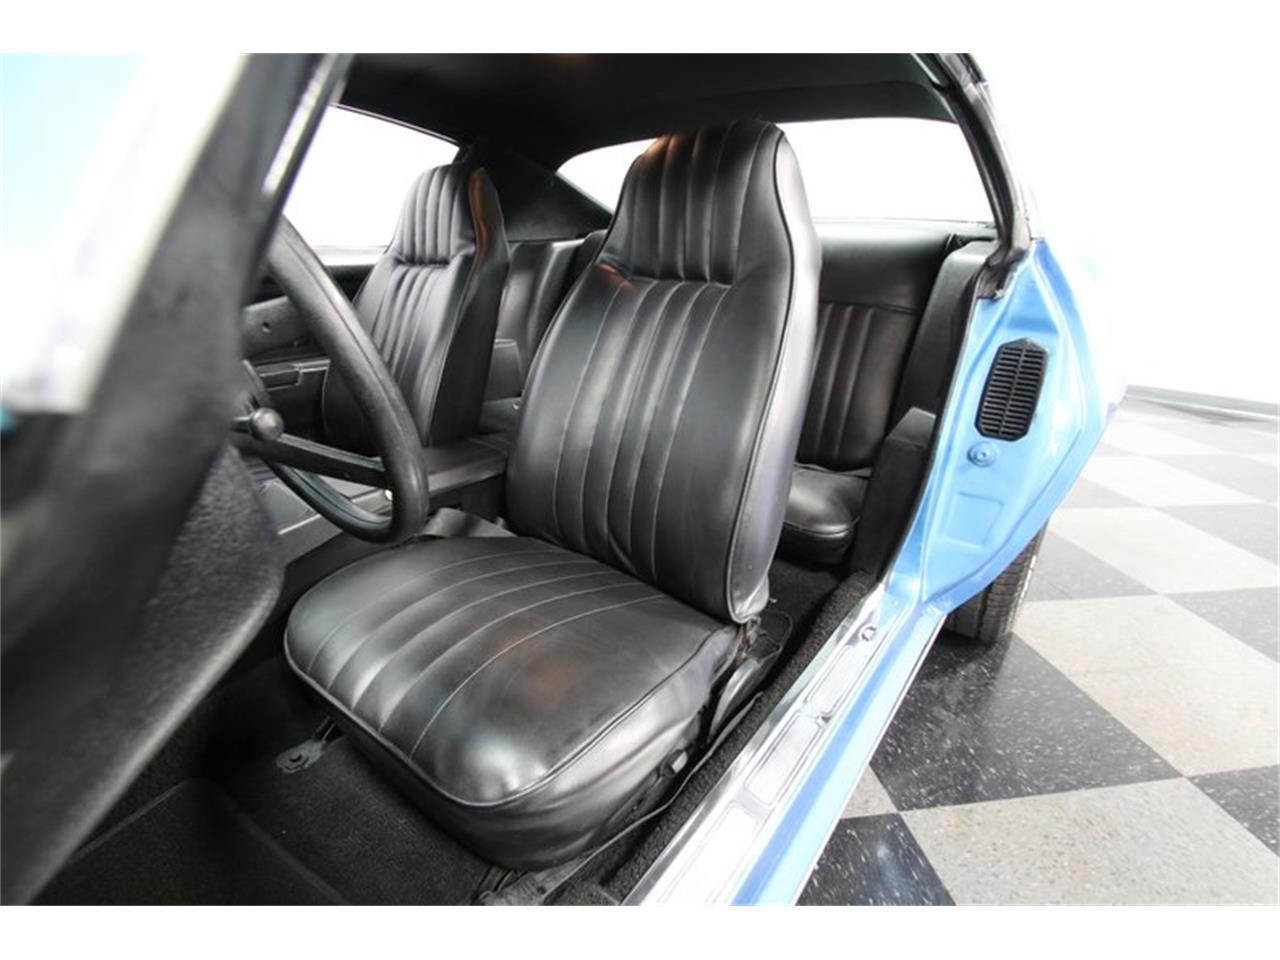 Large Picture of '70 Camaro located in North Carolina - $36,995.00 - QRKC